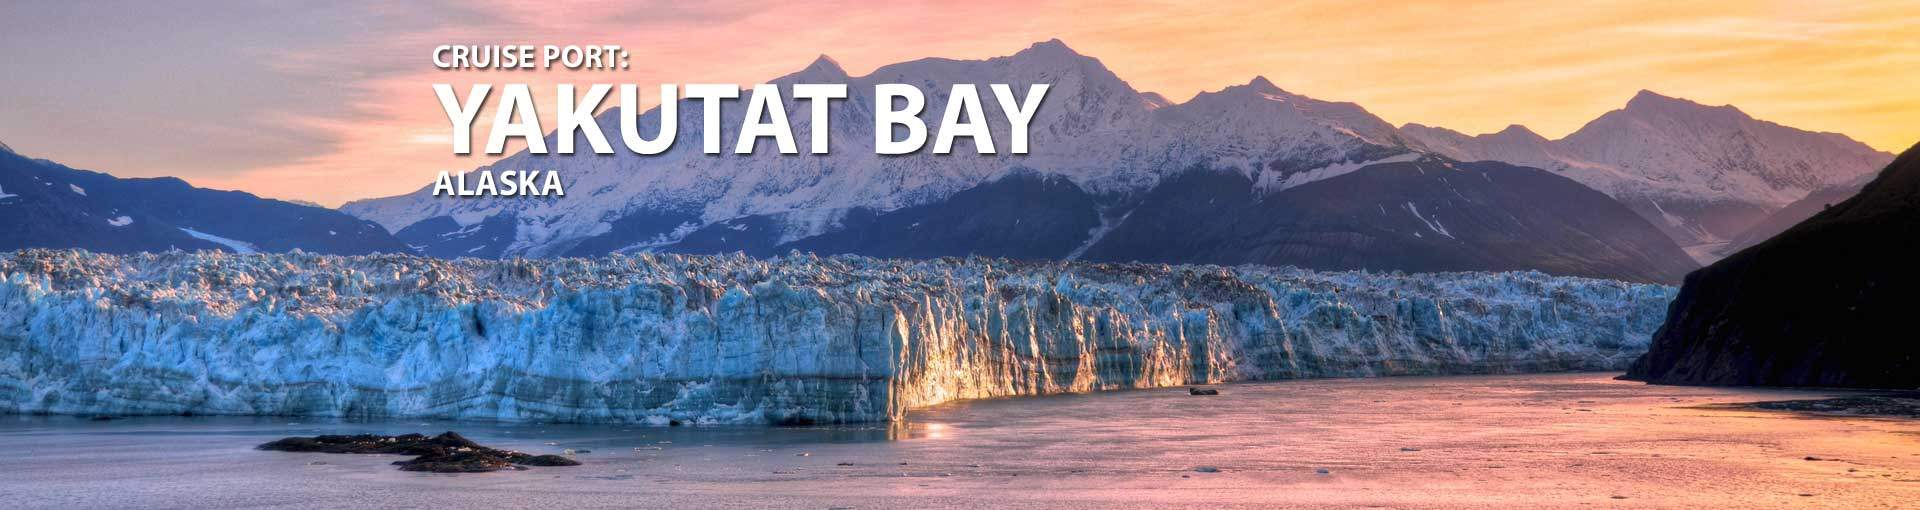 Cruises to Yakutat Bay, Alaska